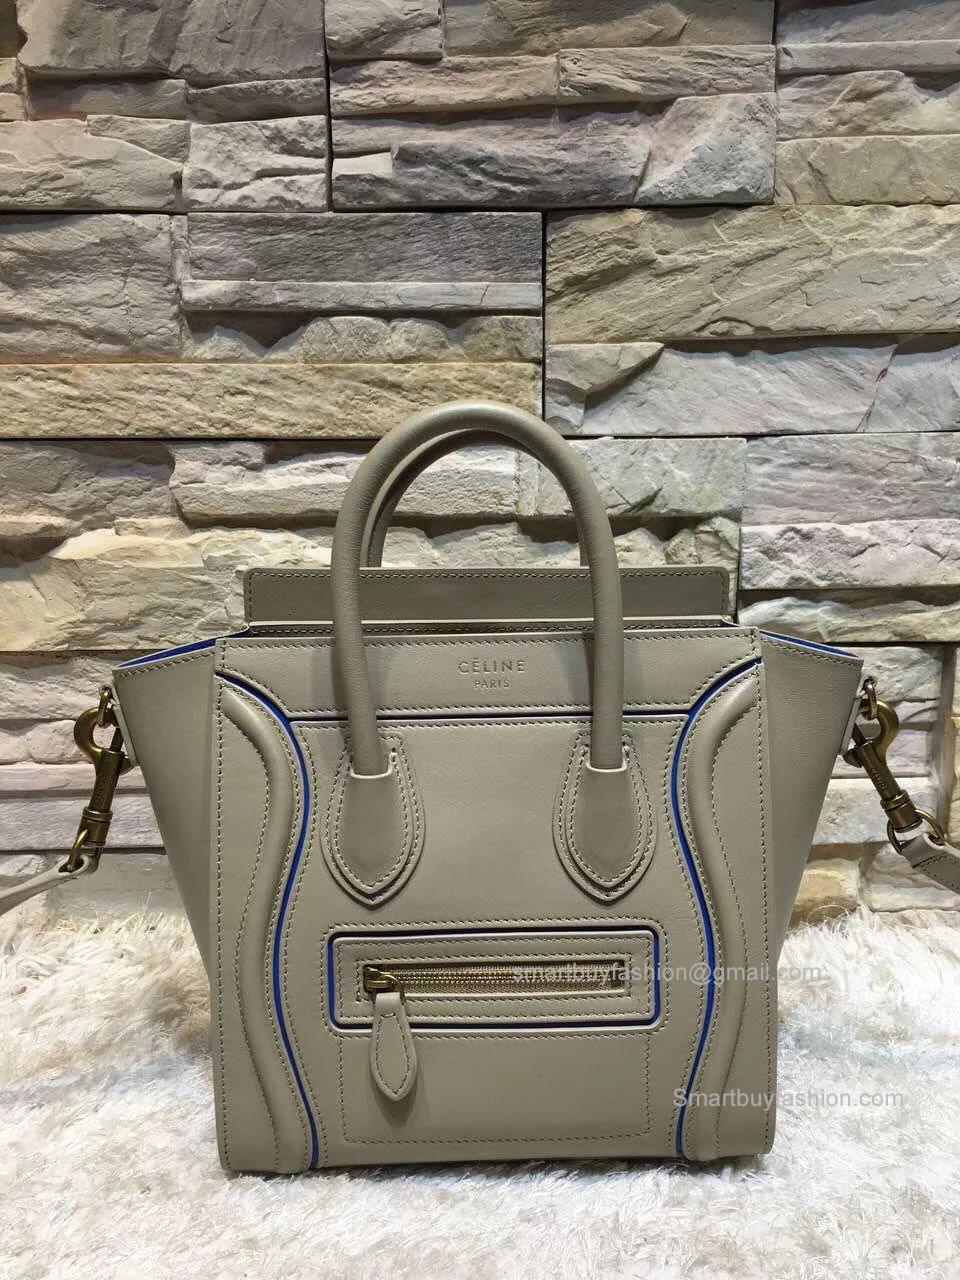 3a708f7bd5 Celine Nano Luggage Handbag with Interstice in Light Grey Smooth Calfskin